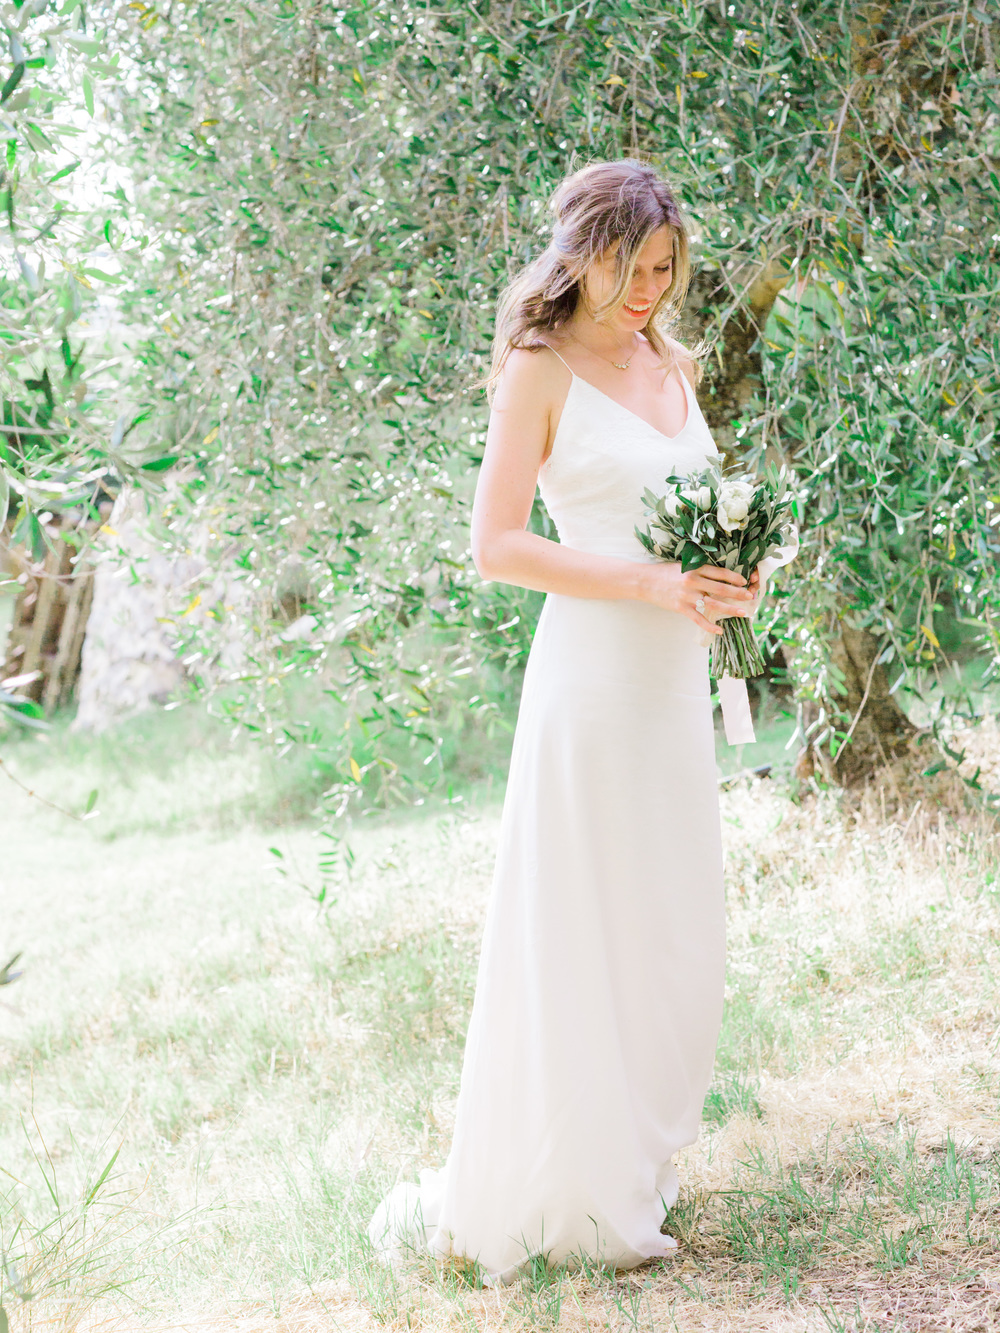 Blanccoco_Photographe_CF_Wedding_Italy_Tuscany_Fattoria_di_Cinciano-613.jpg